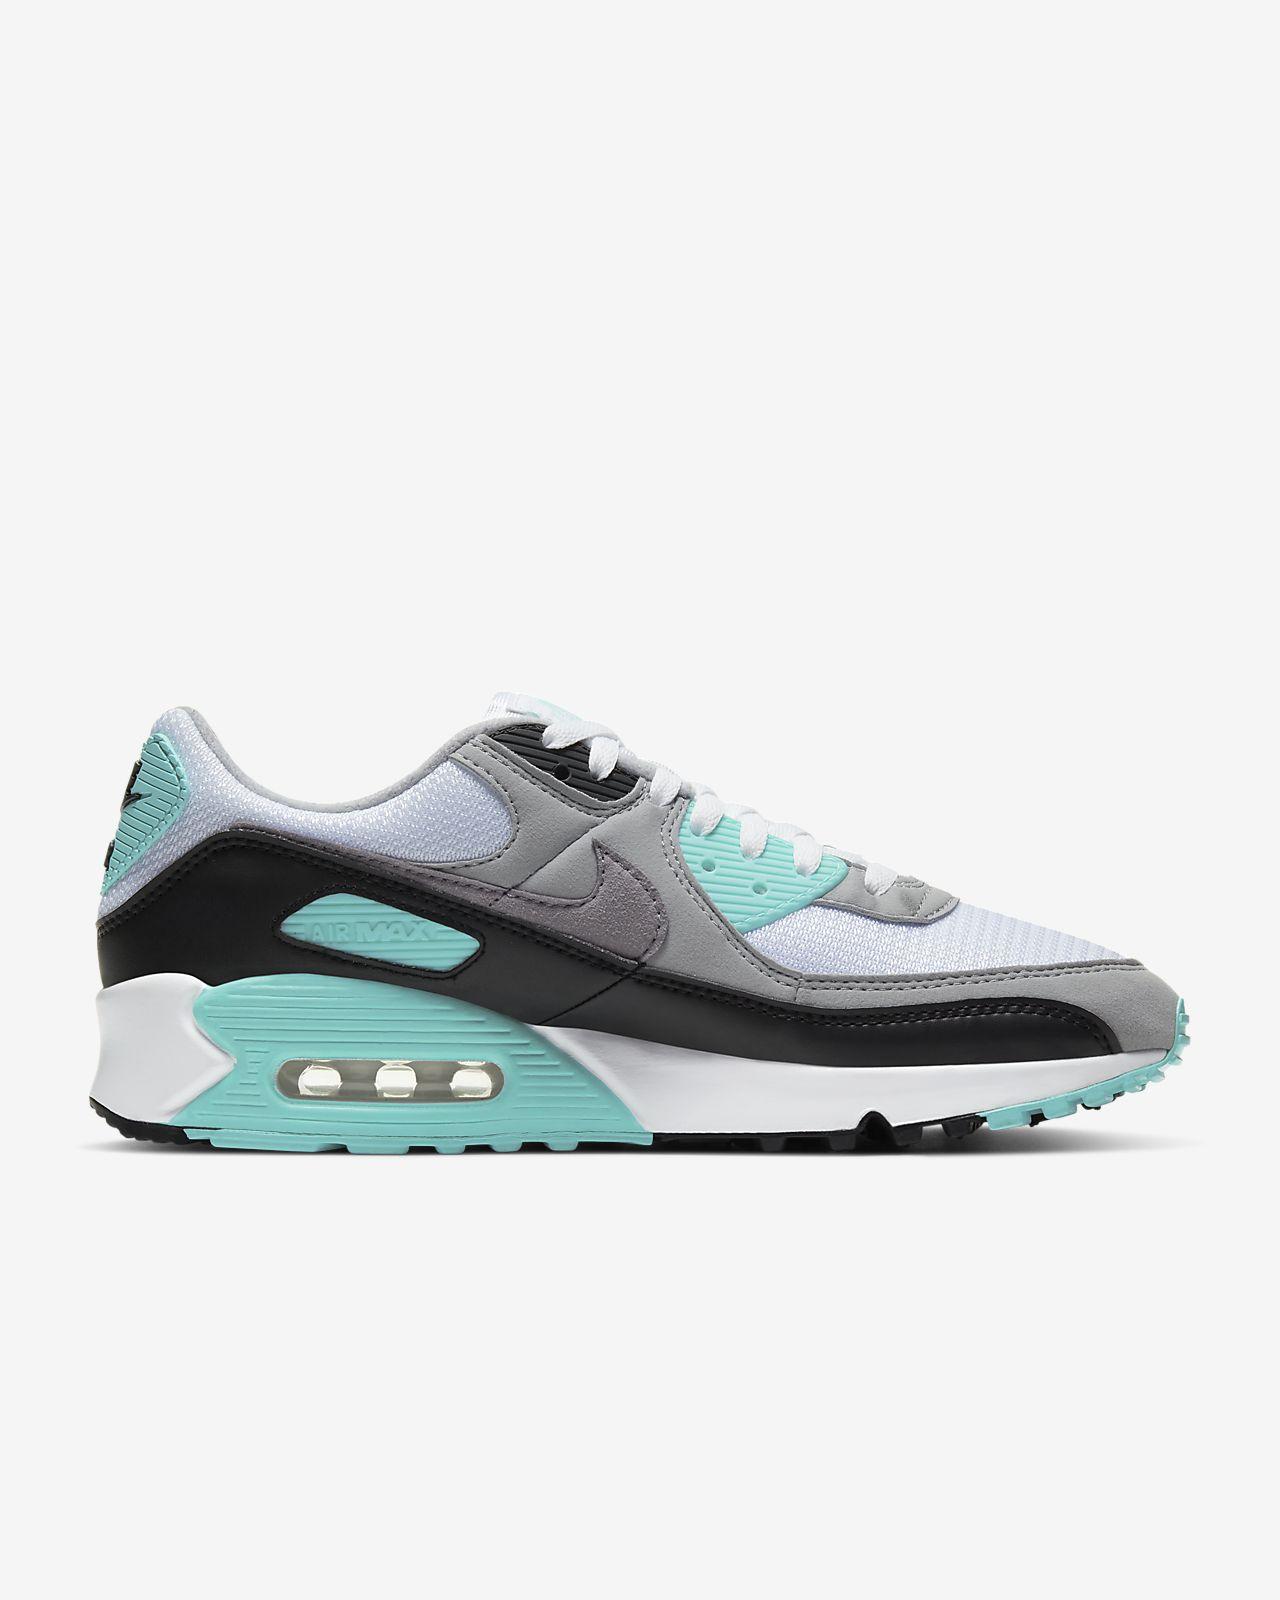 nike air max 90 uomo grey blue